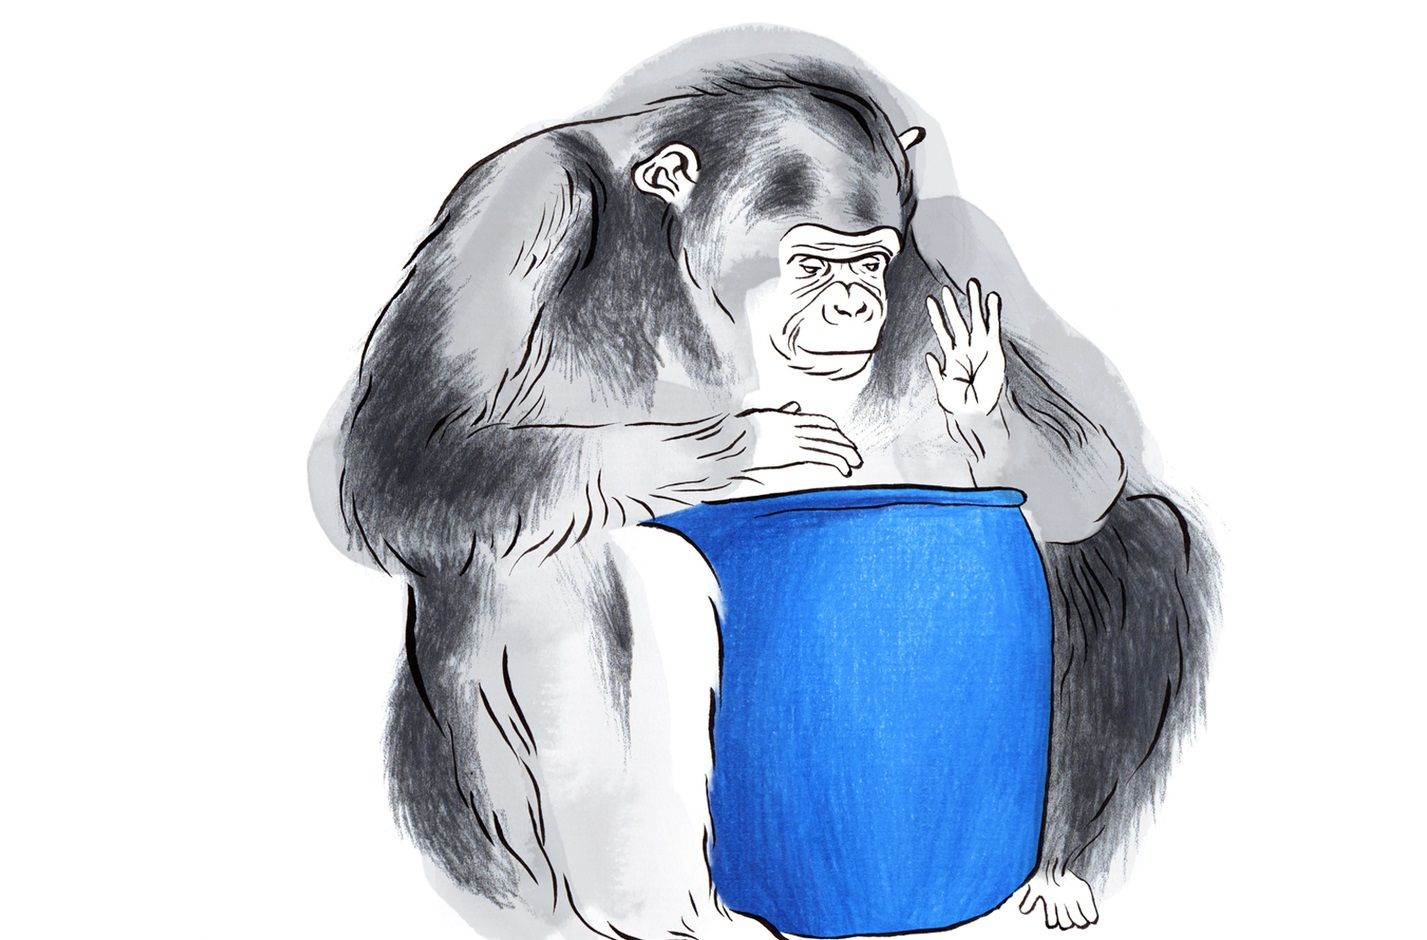 did a chimpanzee perform